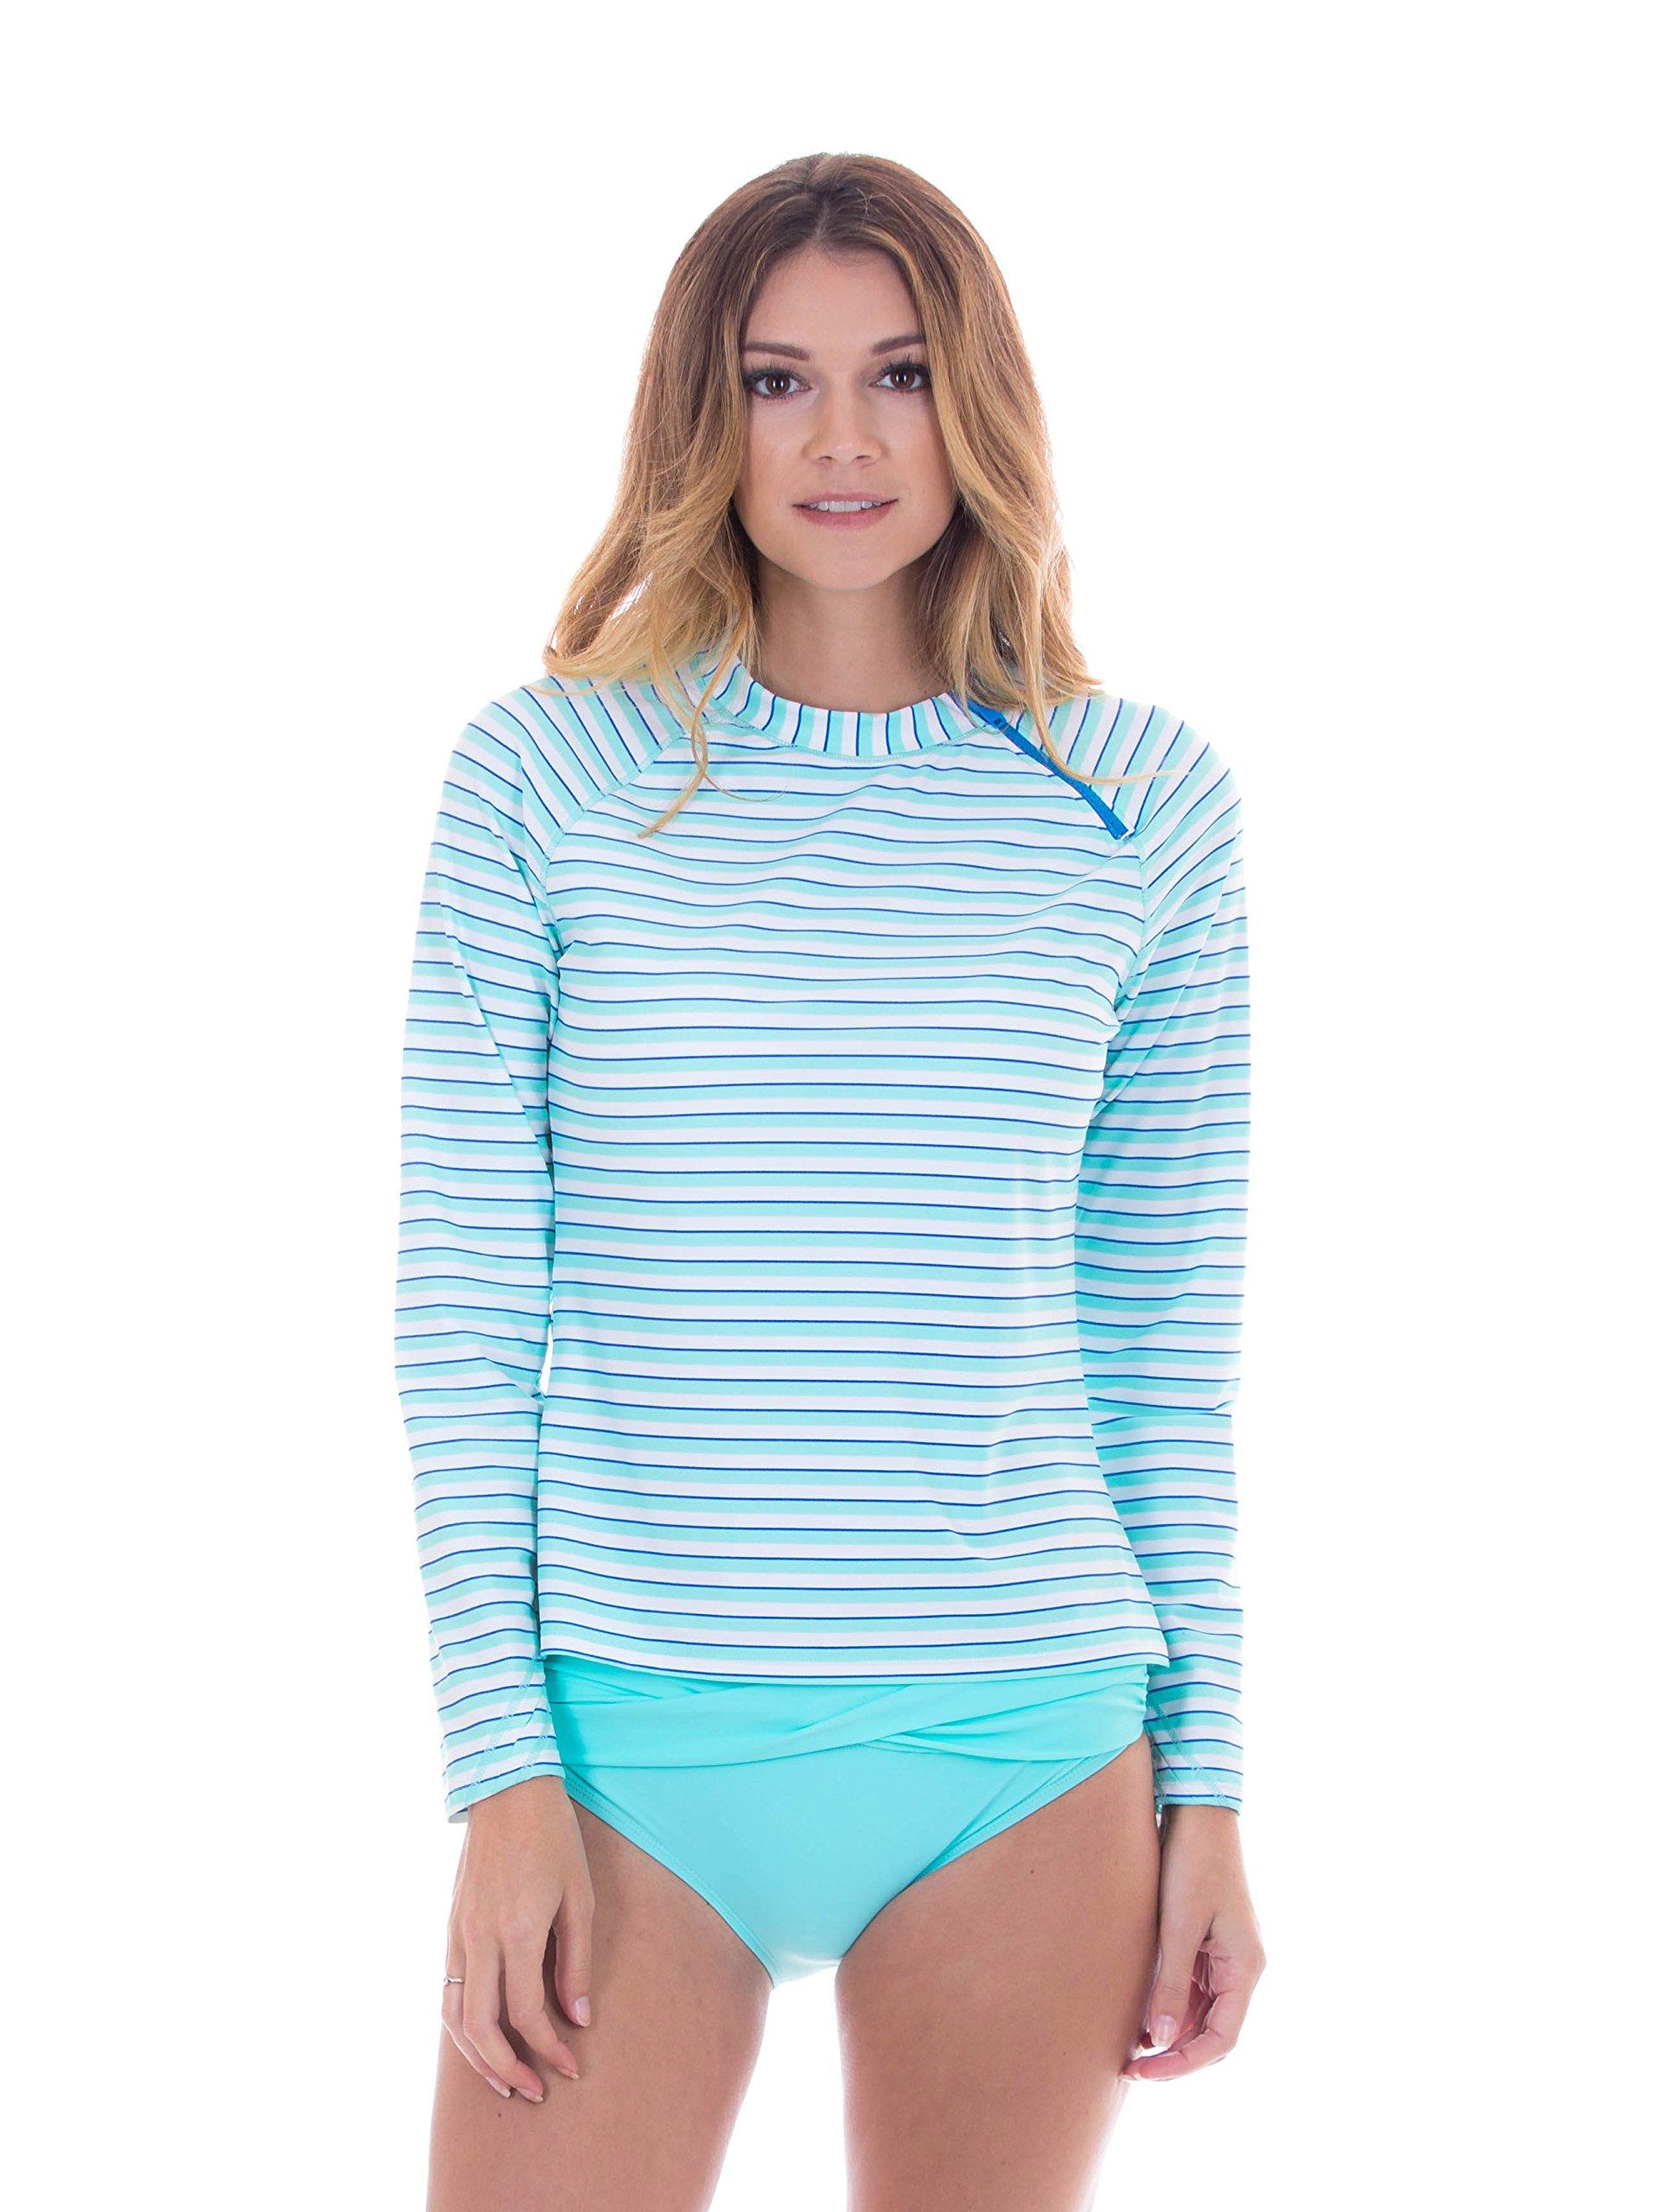 Cabana Life Women's Long Sleeve Zipper Rashguard - Medium - Aqua Double Stripe